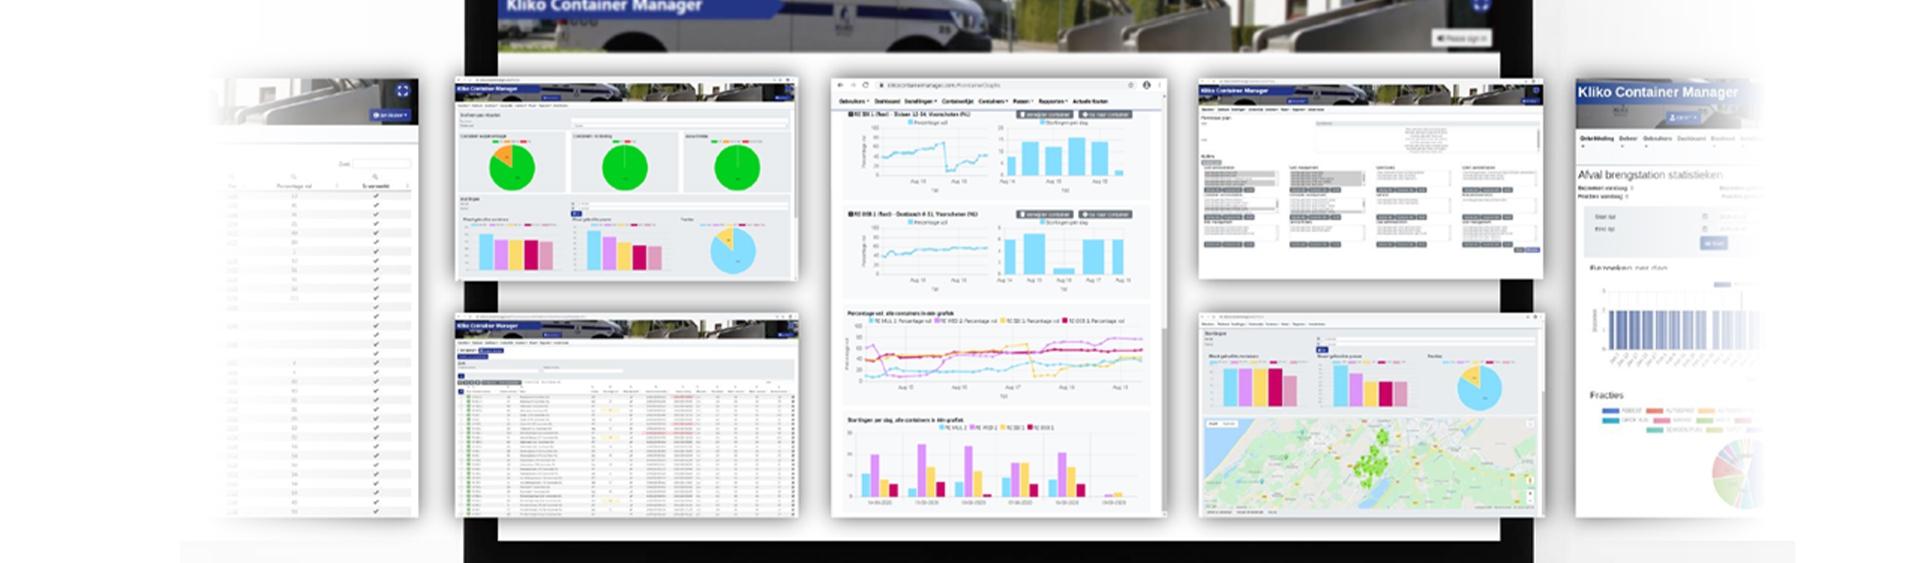 KMP Service Portal